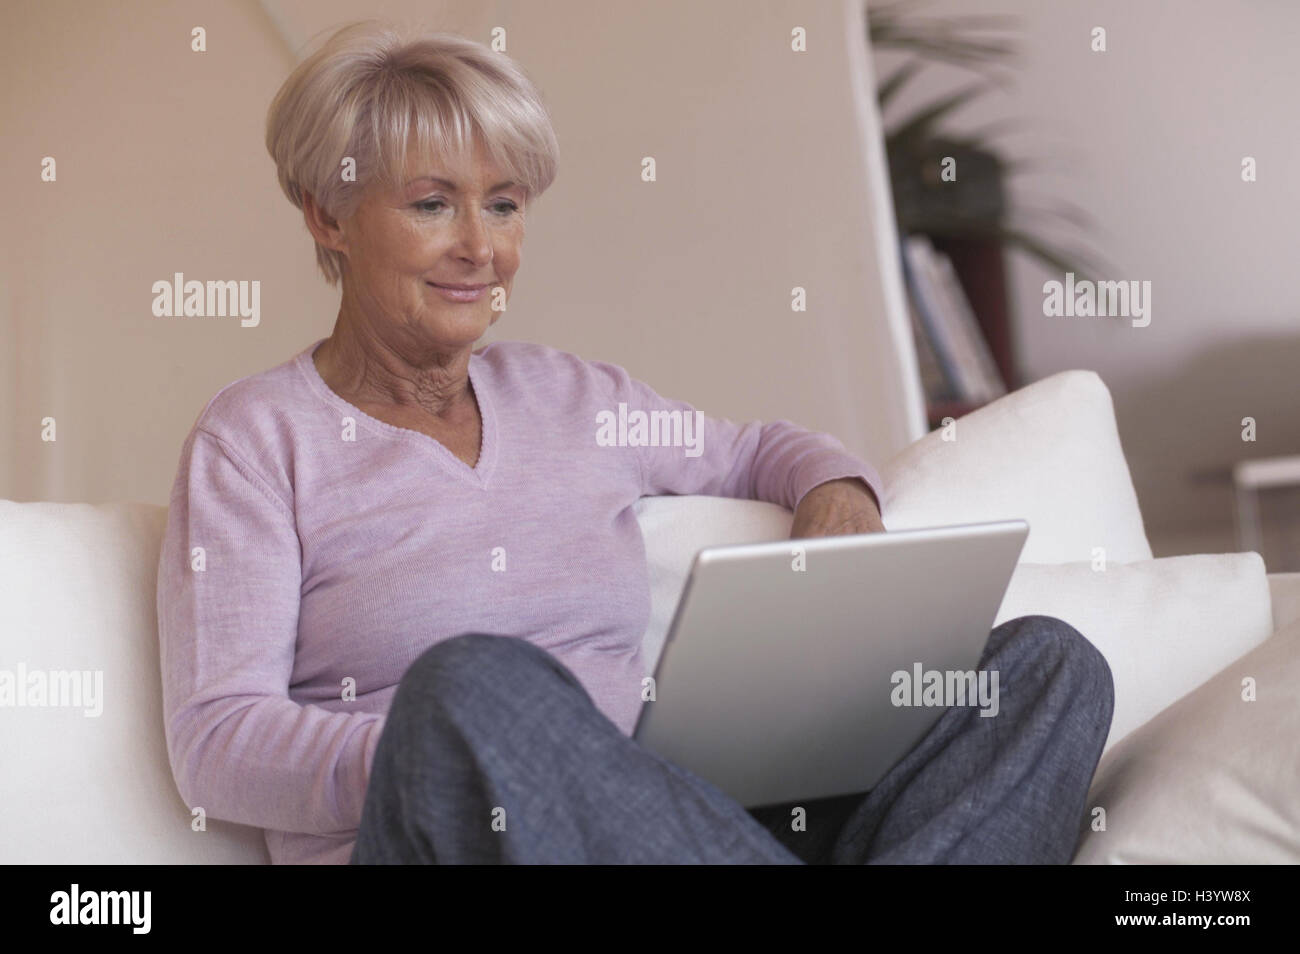 Senior over 65 dating paras kytkennät baarit Austin